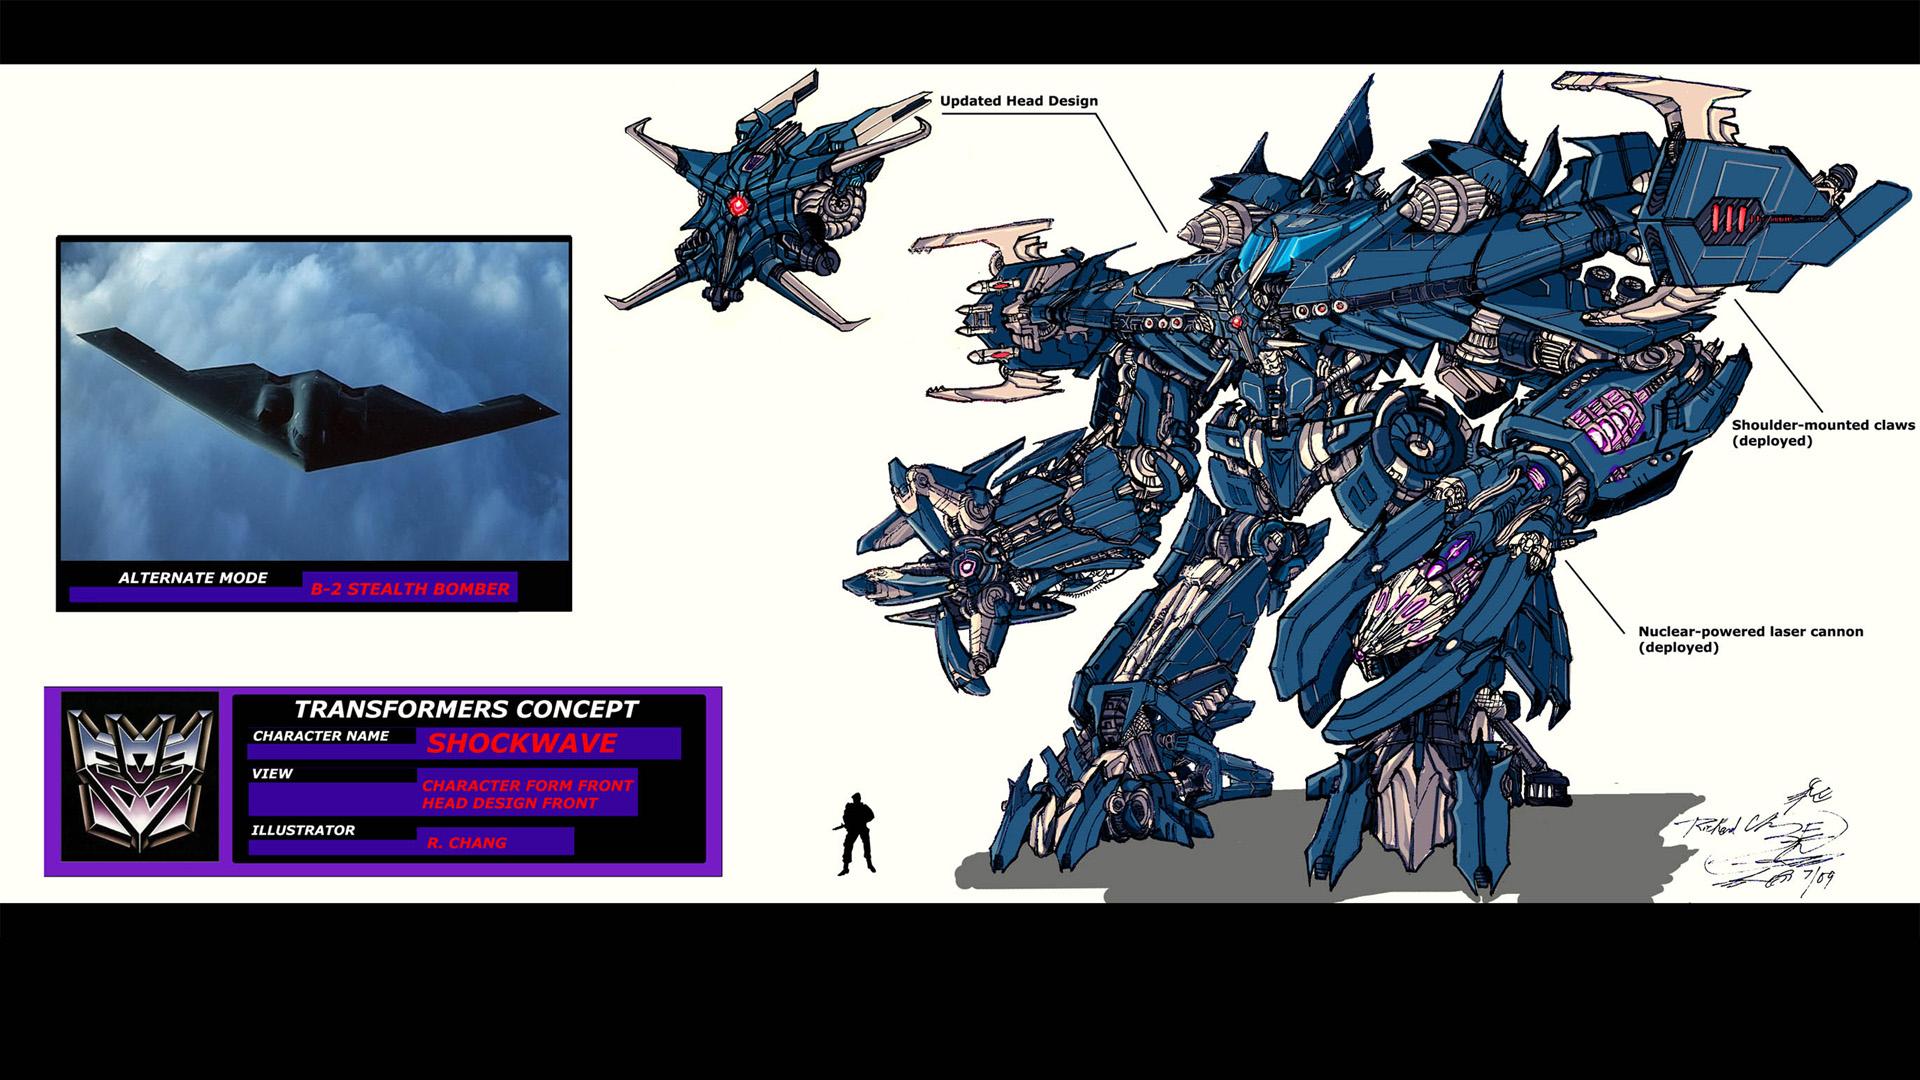 Transformers 3 Dark of the Moon Wallpapers 1920 x 1080 pixels 1920x1080